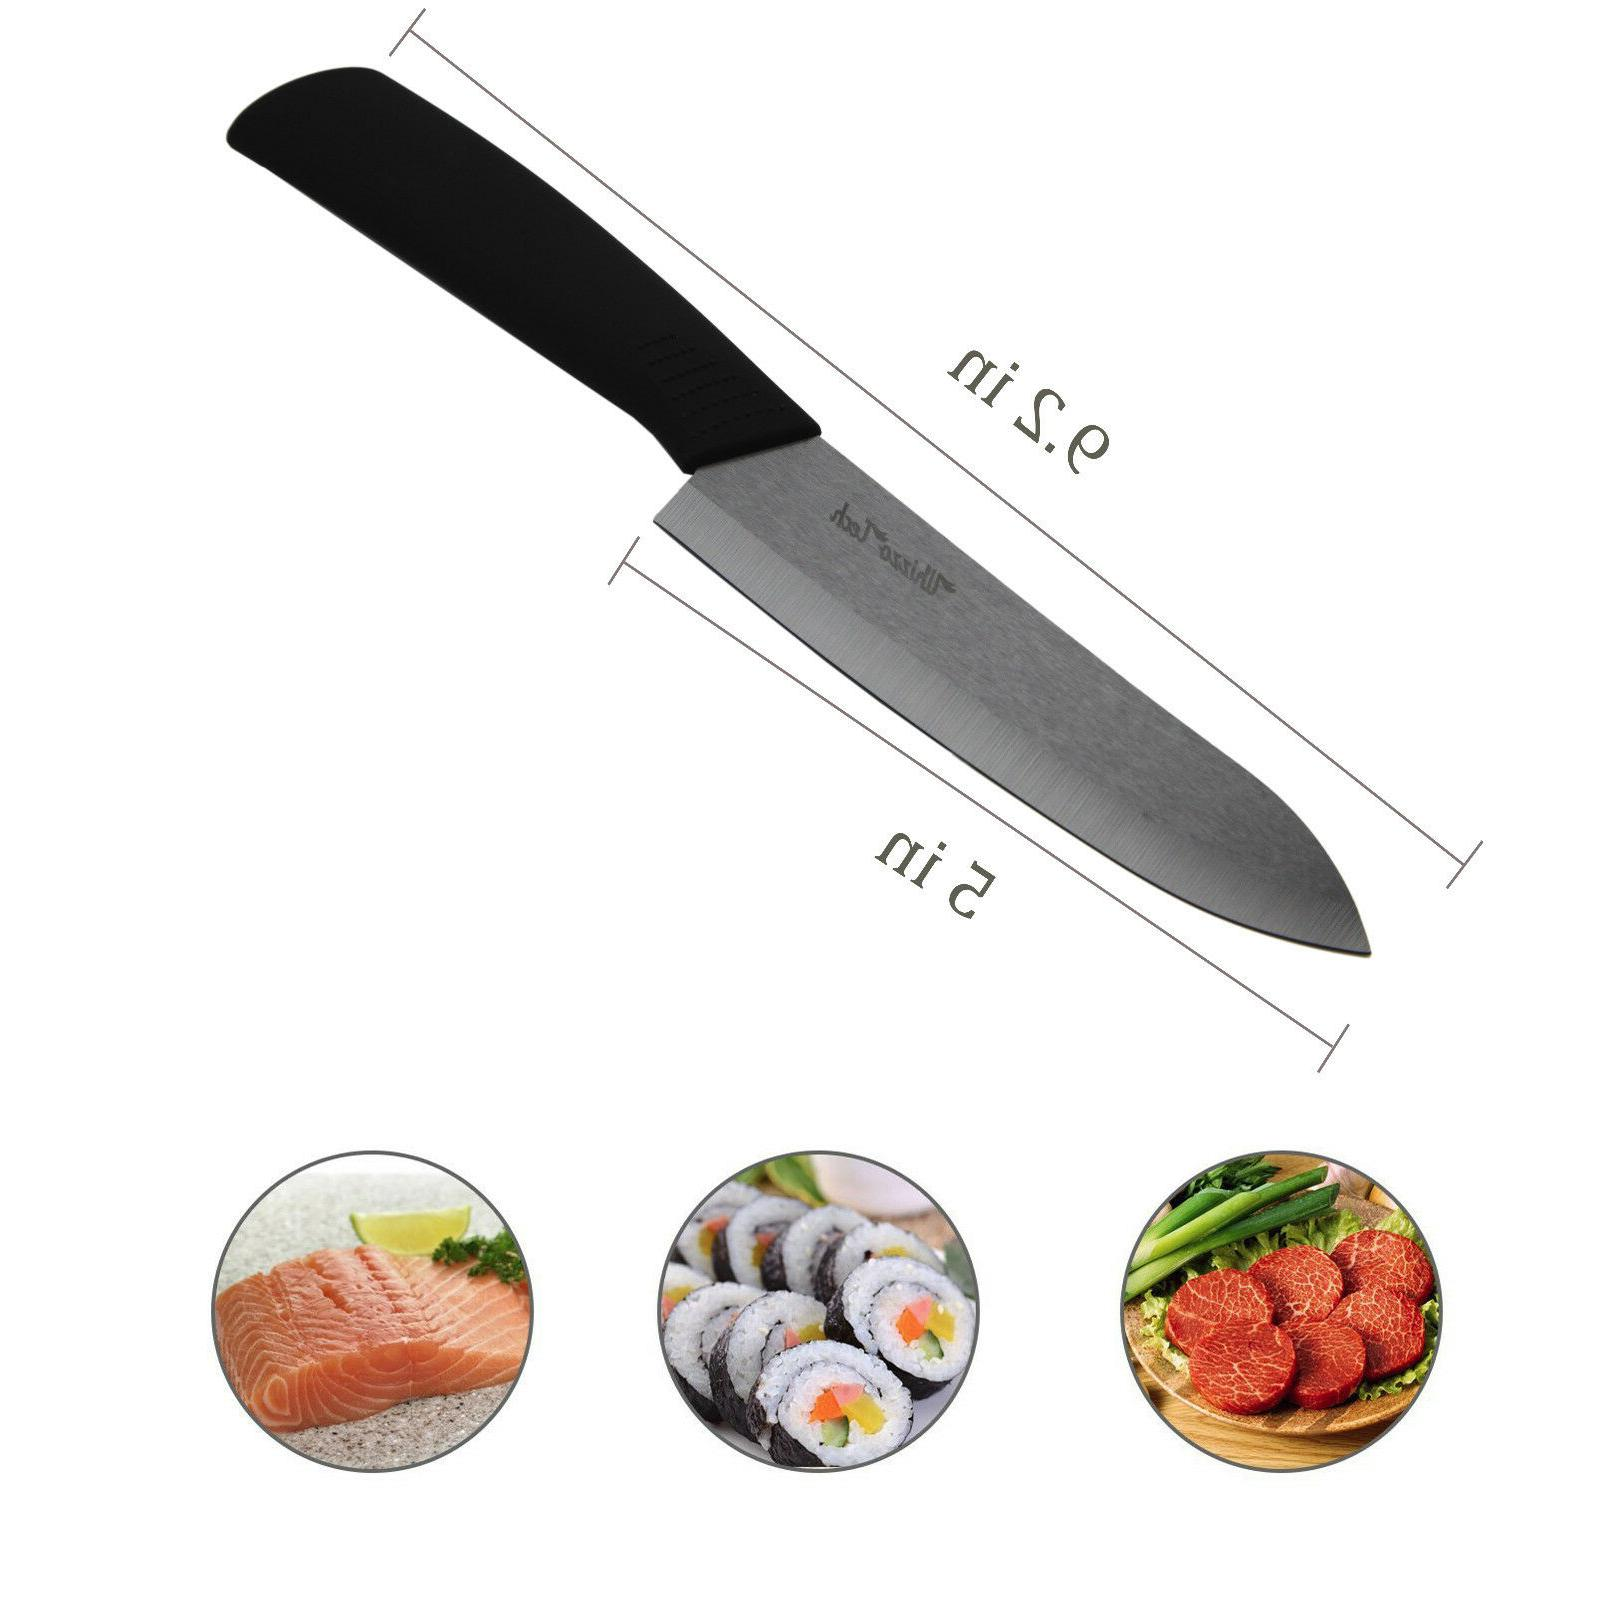 "Blade Ceramic knife Set Kitchen 3"" 4"" 5"" 6"" + Peeler Knife"